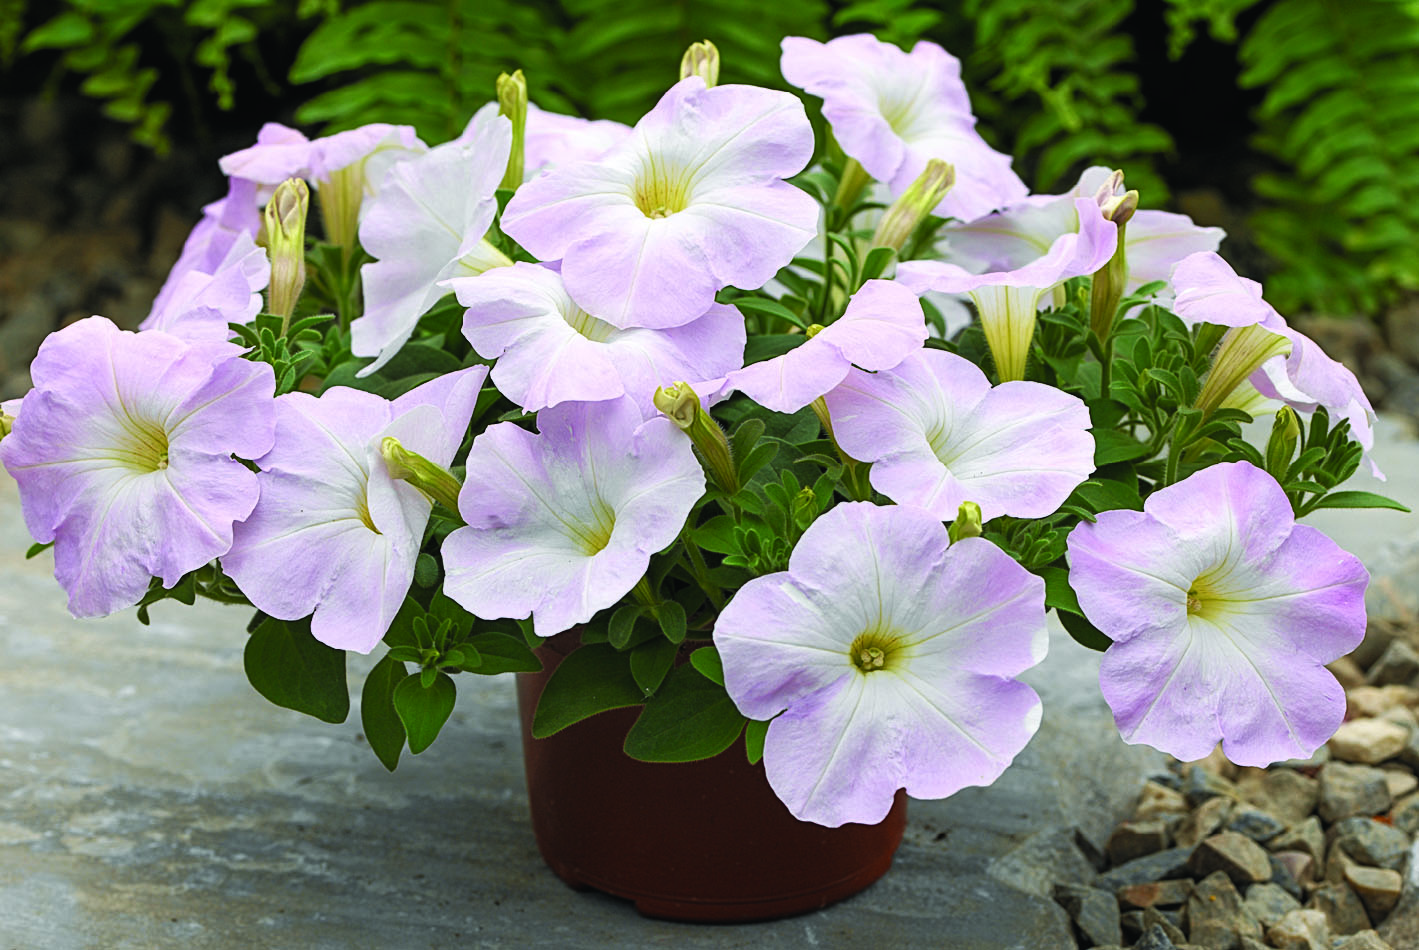 цветок петунья рамблин